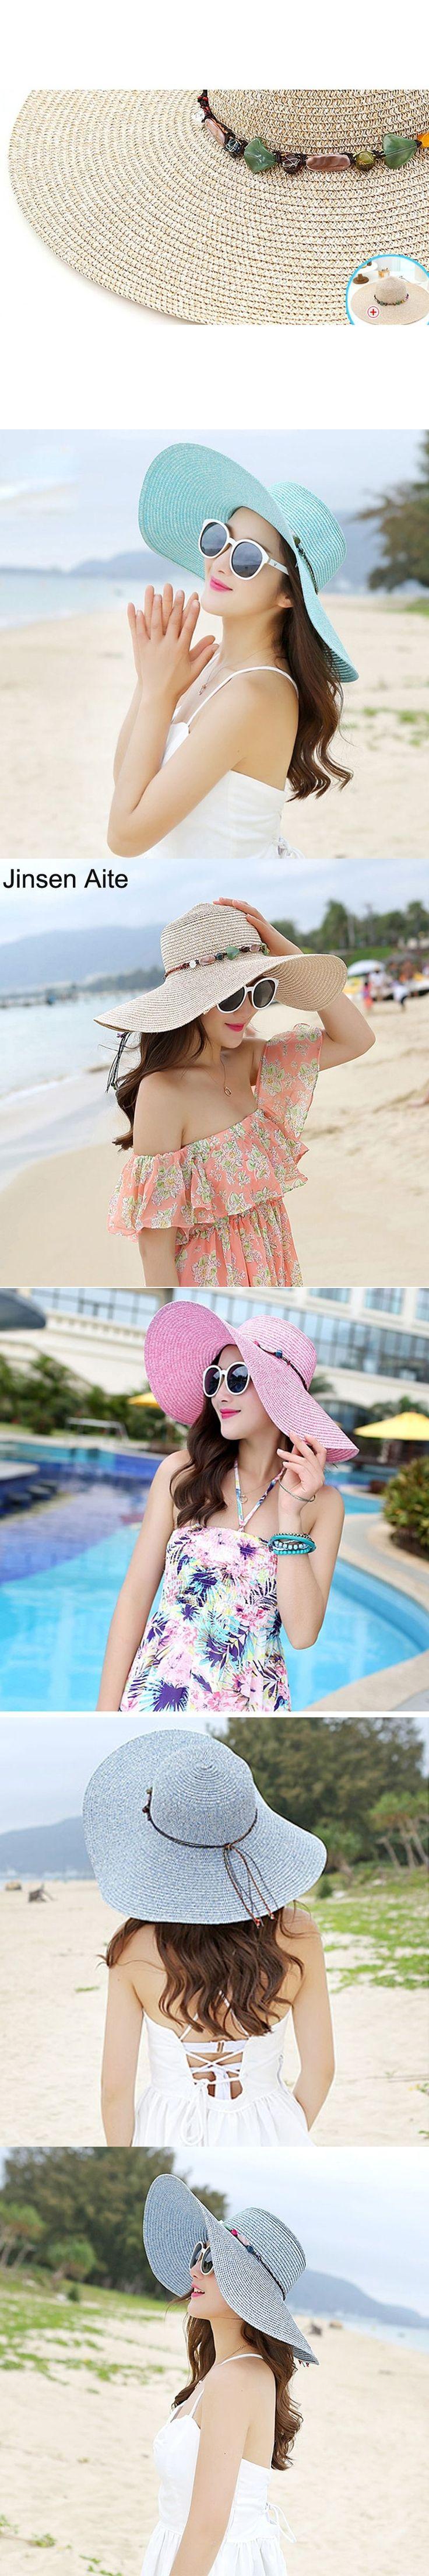 2017 New Fashion Beach Hats For Women Sun Hats Summer Big Brim Hat Woman Floppy Straw Hat Solid Outdoor Seaside Sombreros 1849 #BeachHatsForWomen